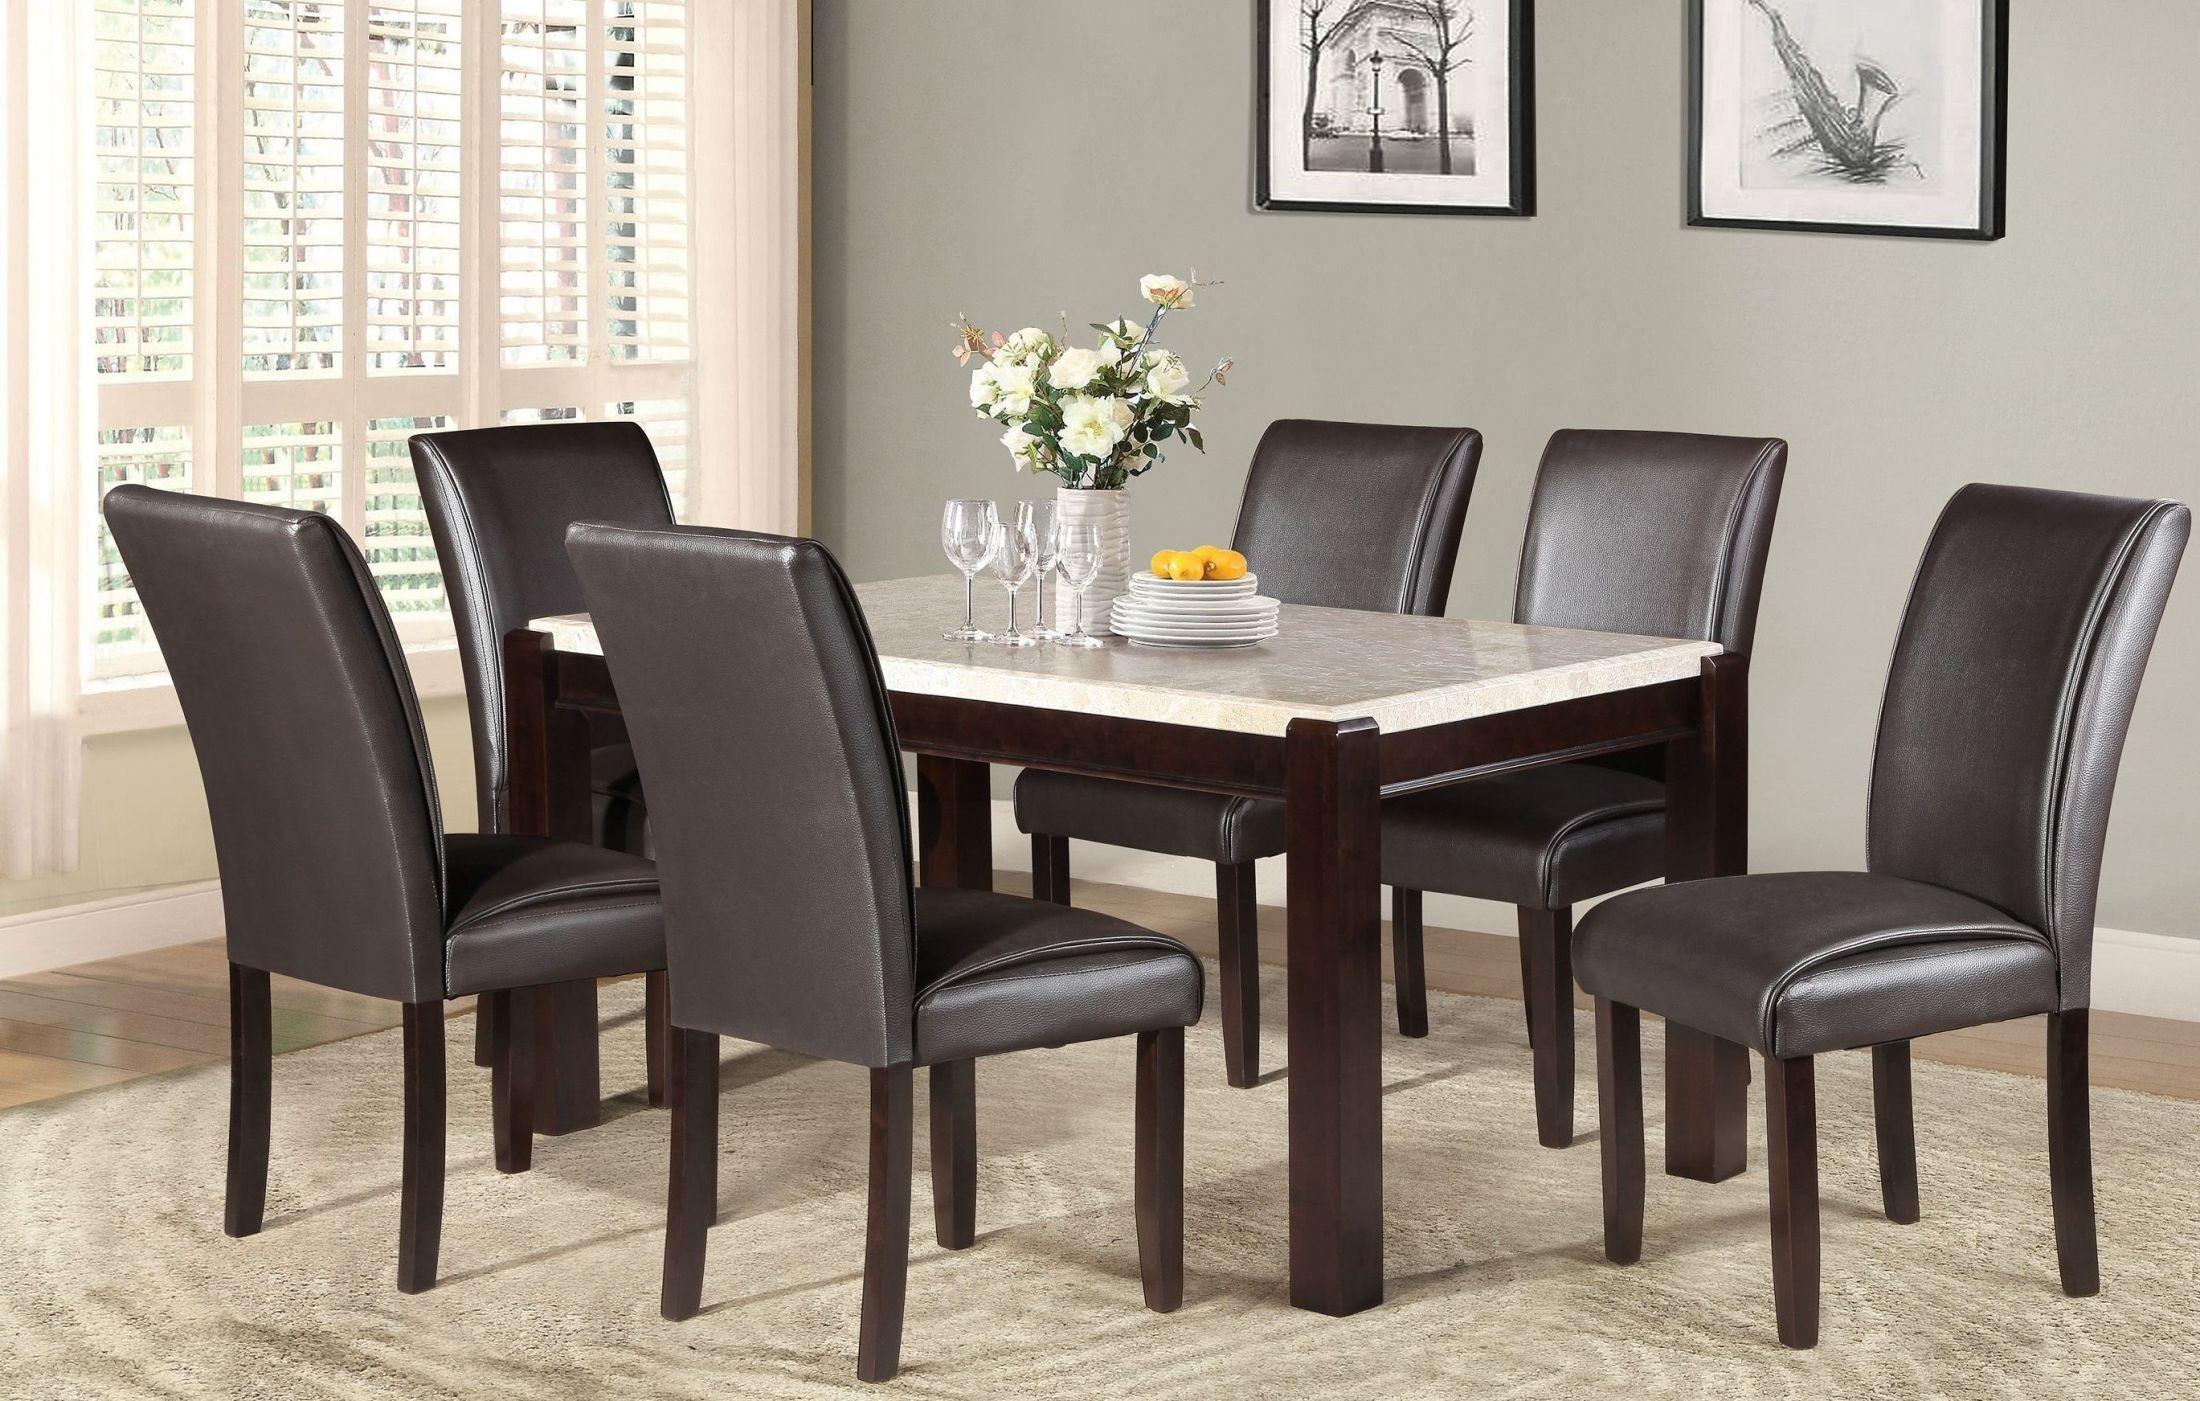 Festus brown dining room set from homelegance coleman for Brown dining room set